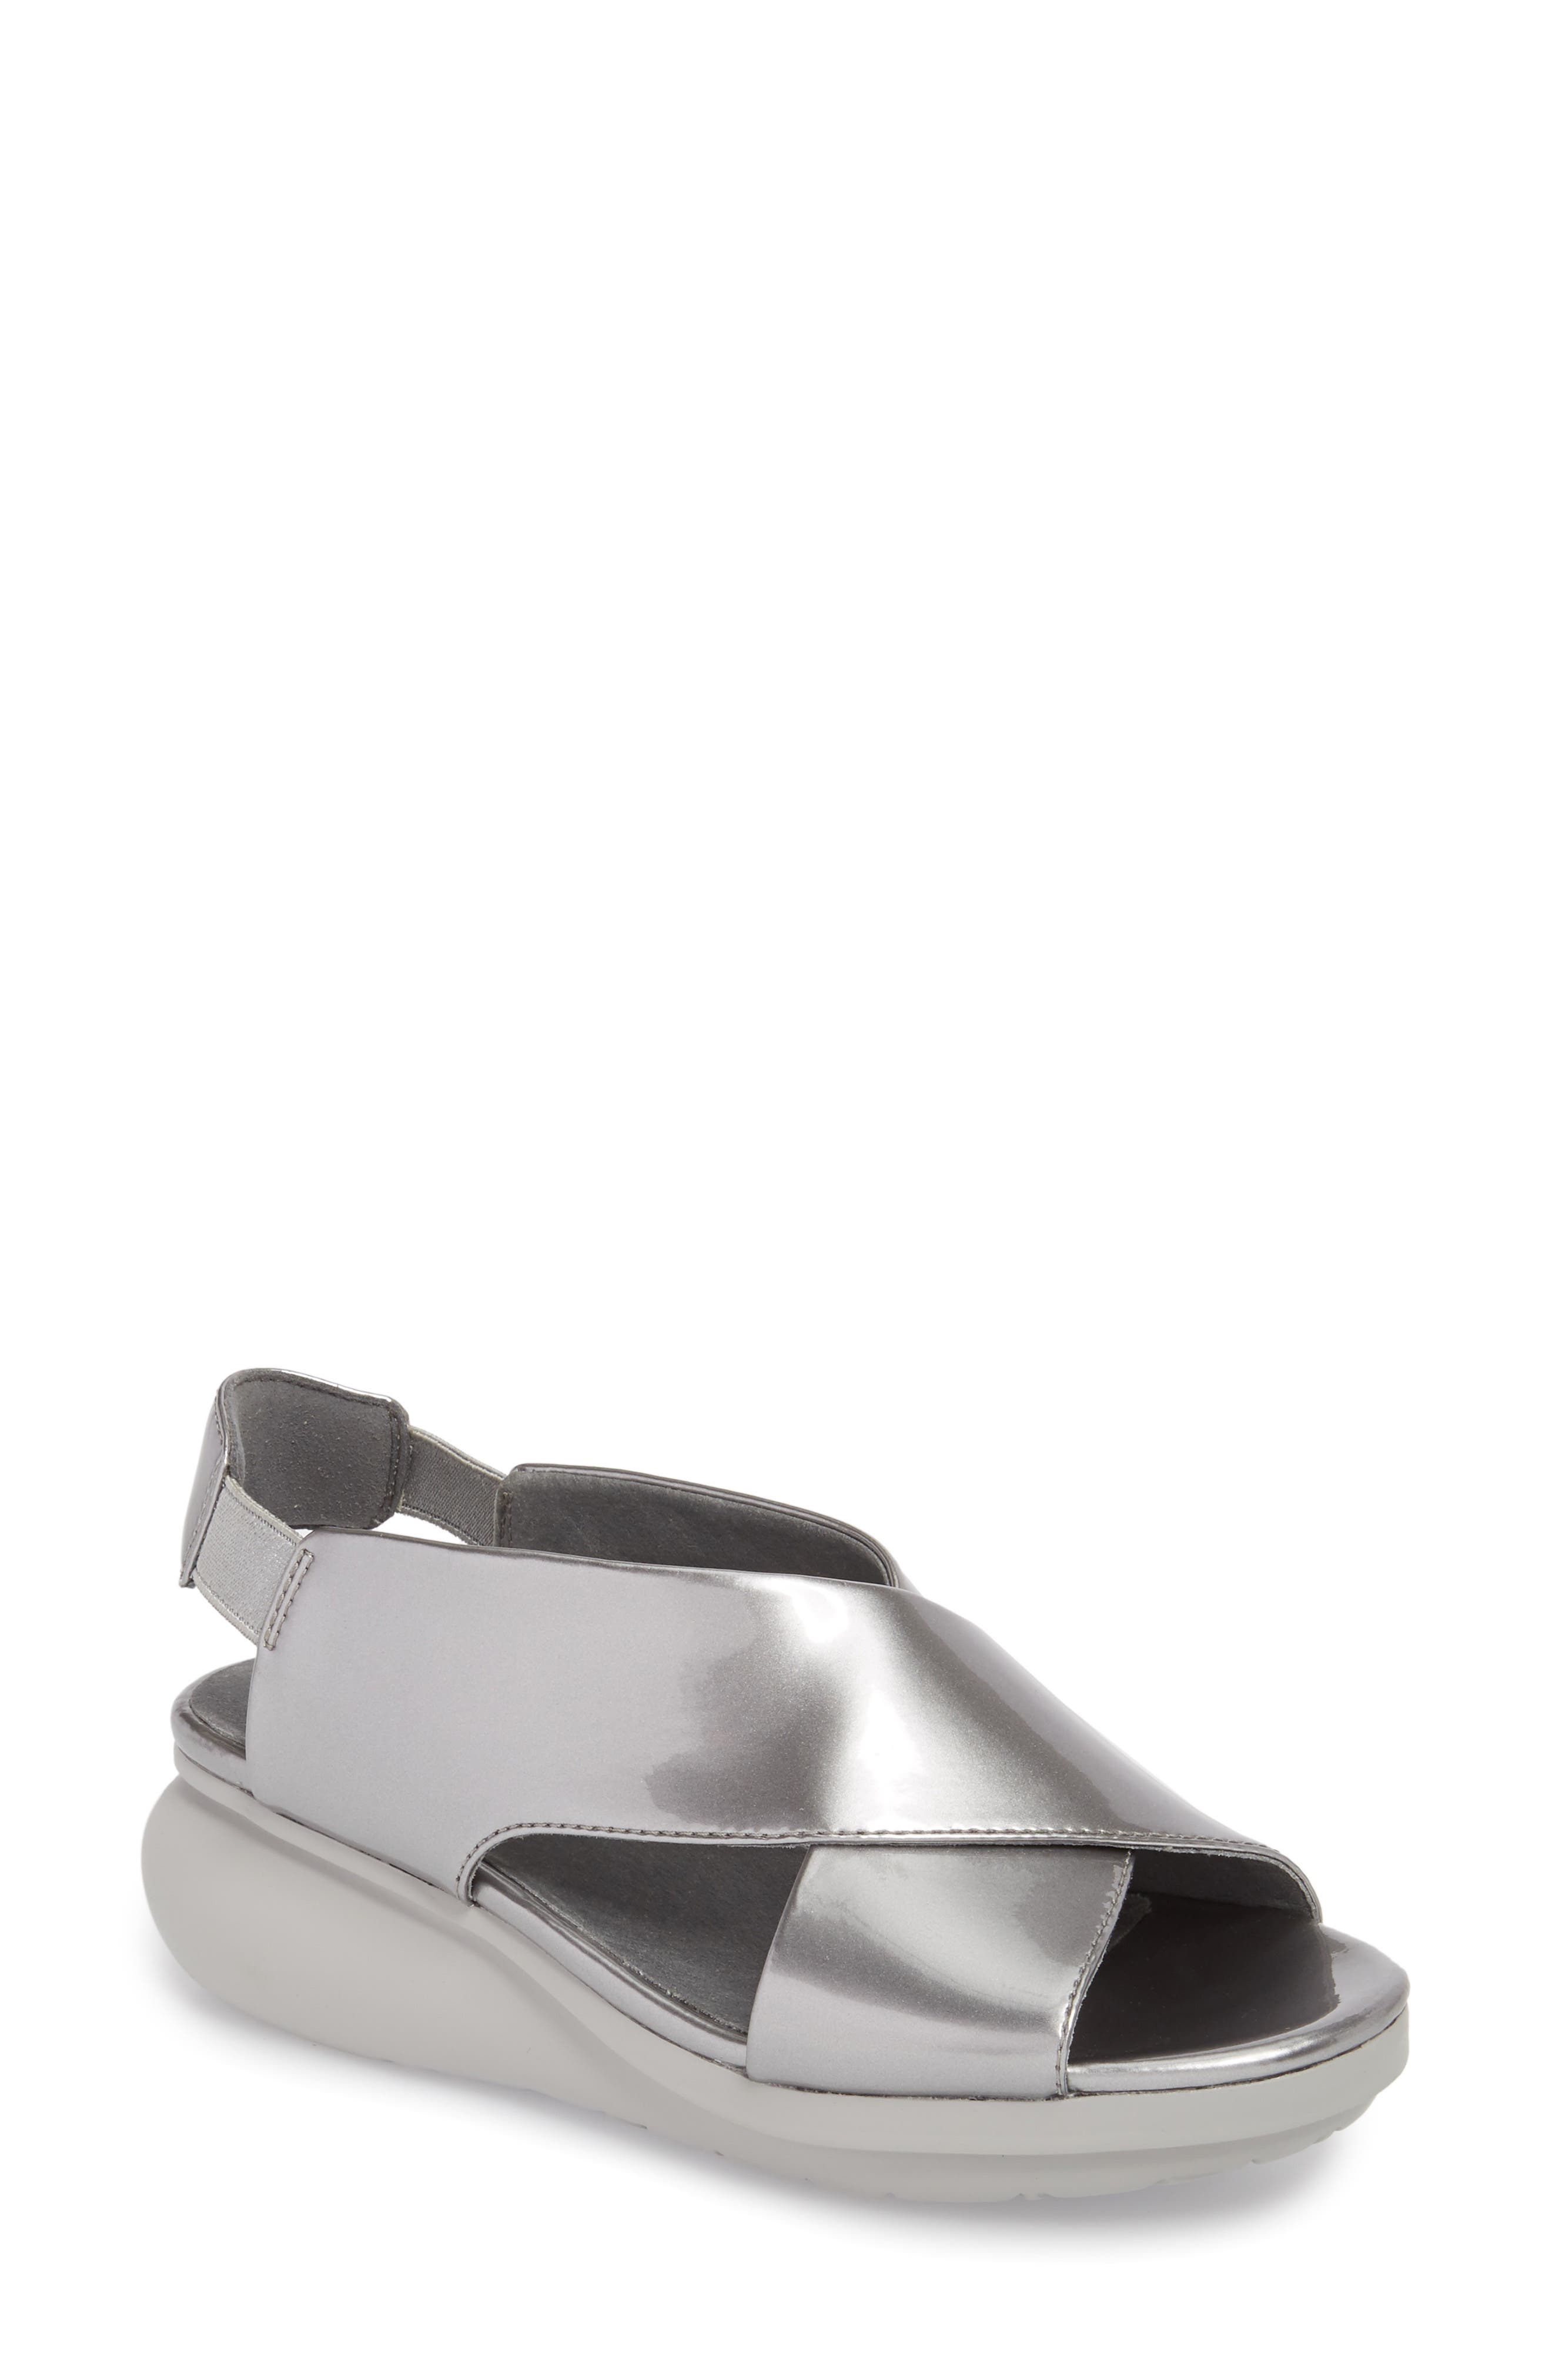 Balloon Wedge Sandal,                         Main,                         color, Medium Gray Leather